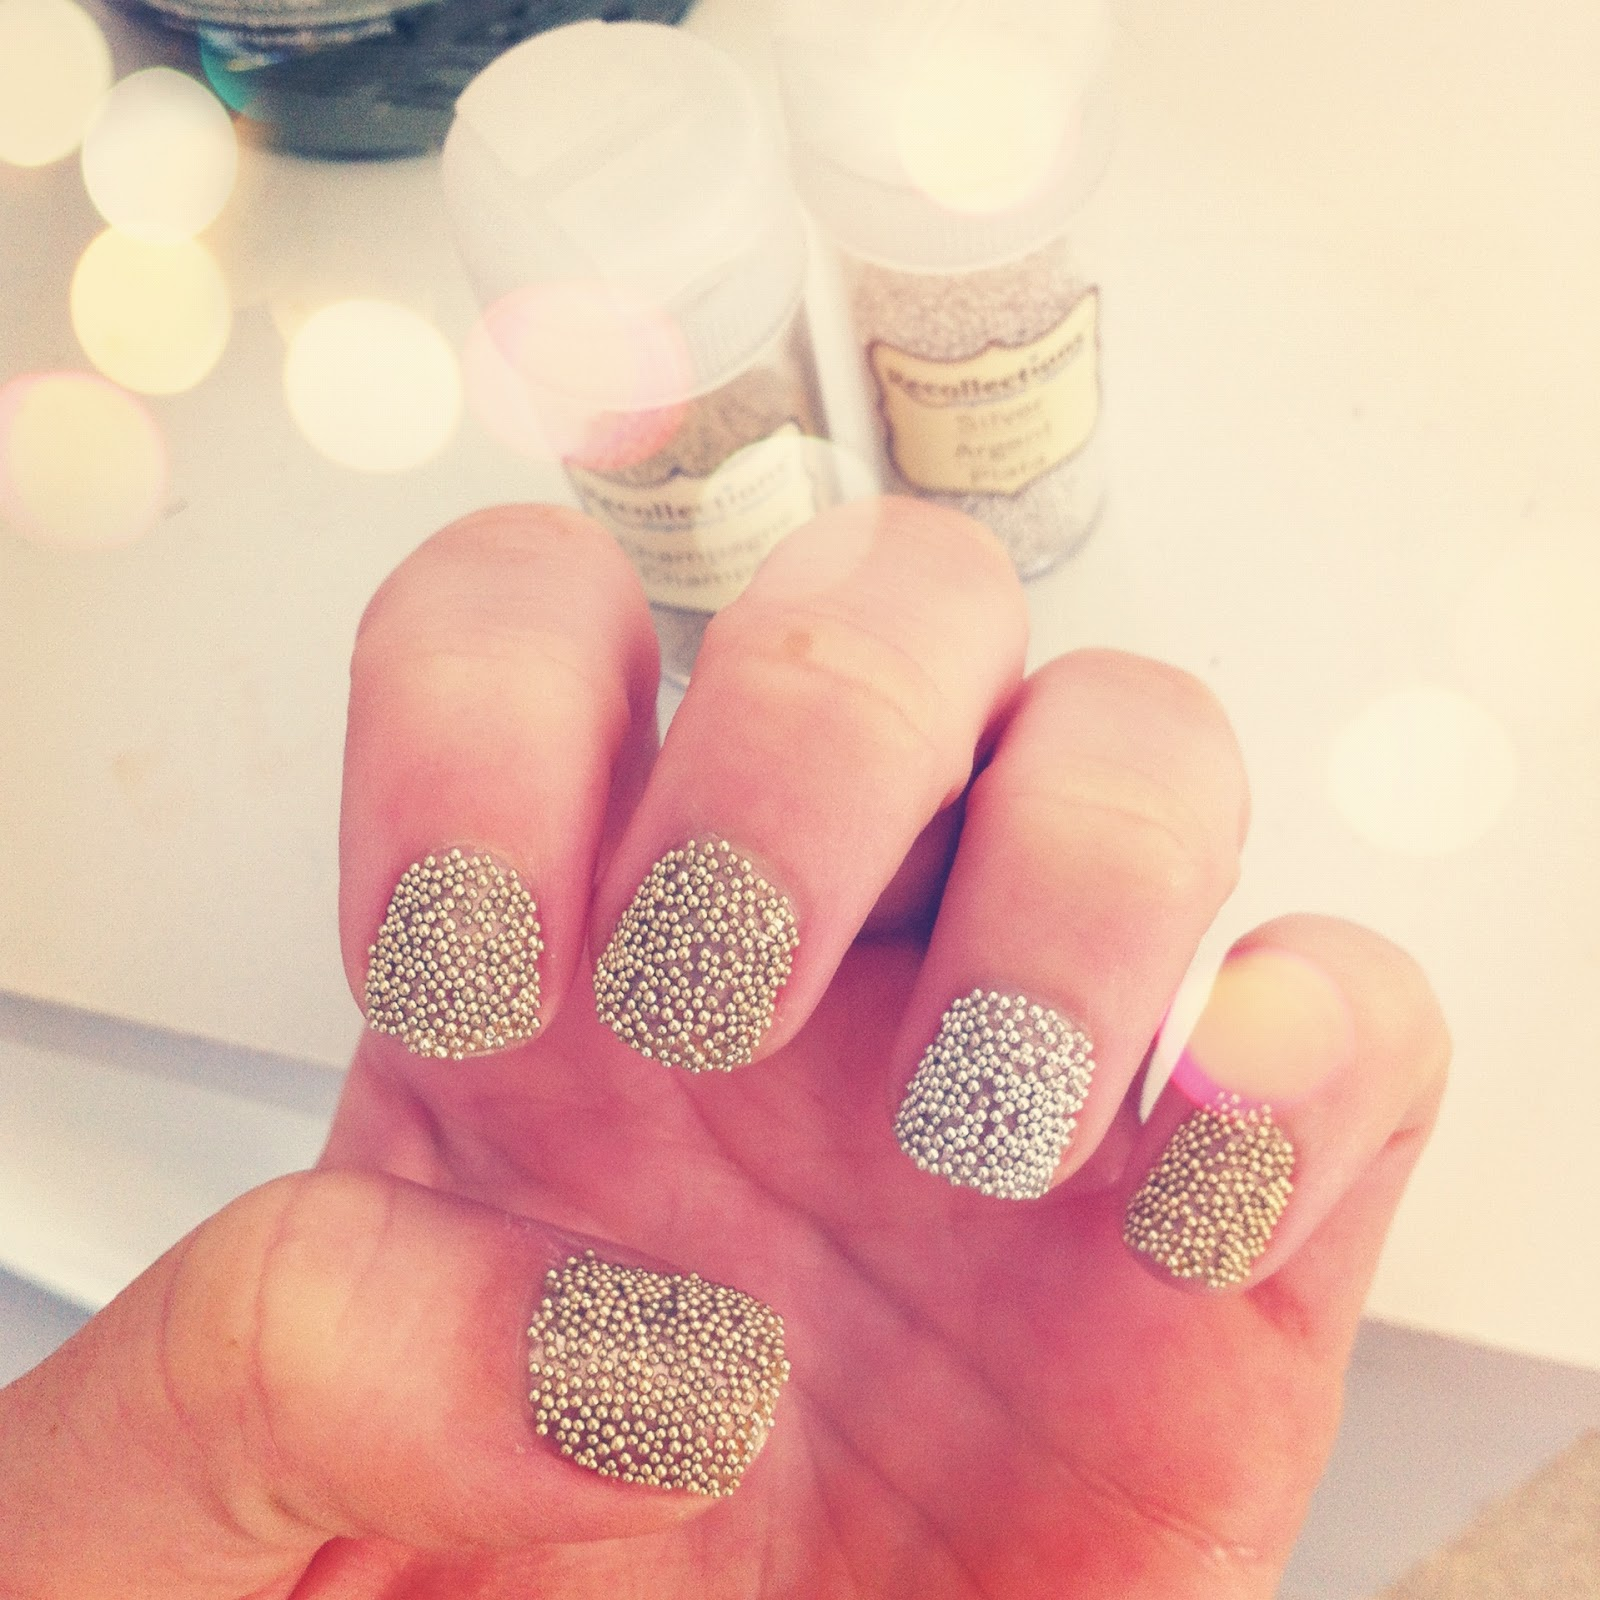 Caviar Nails: Nail Caviar Review@^